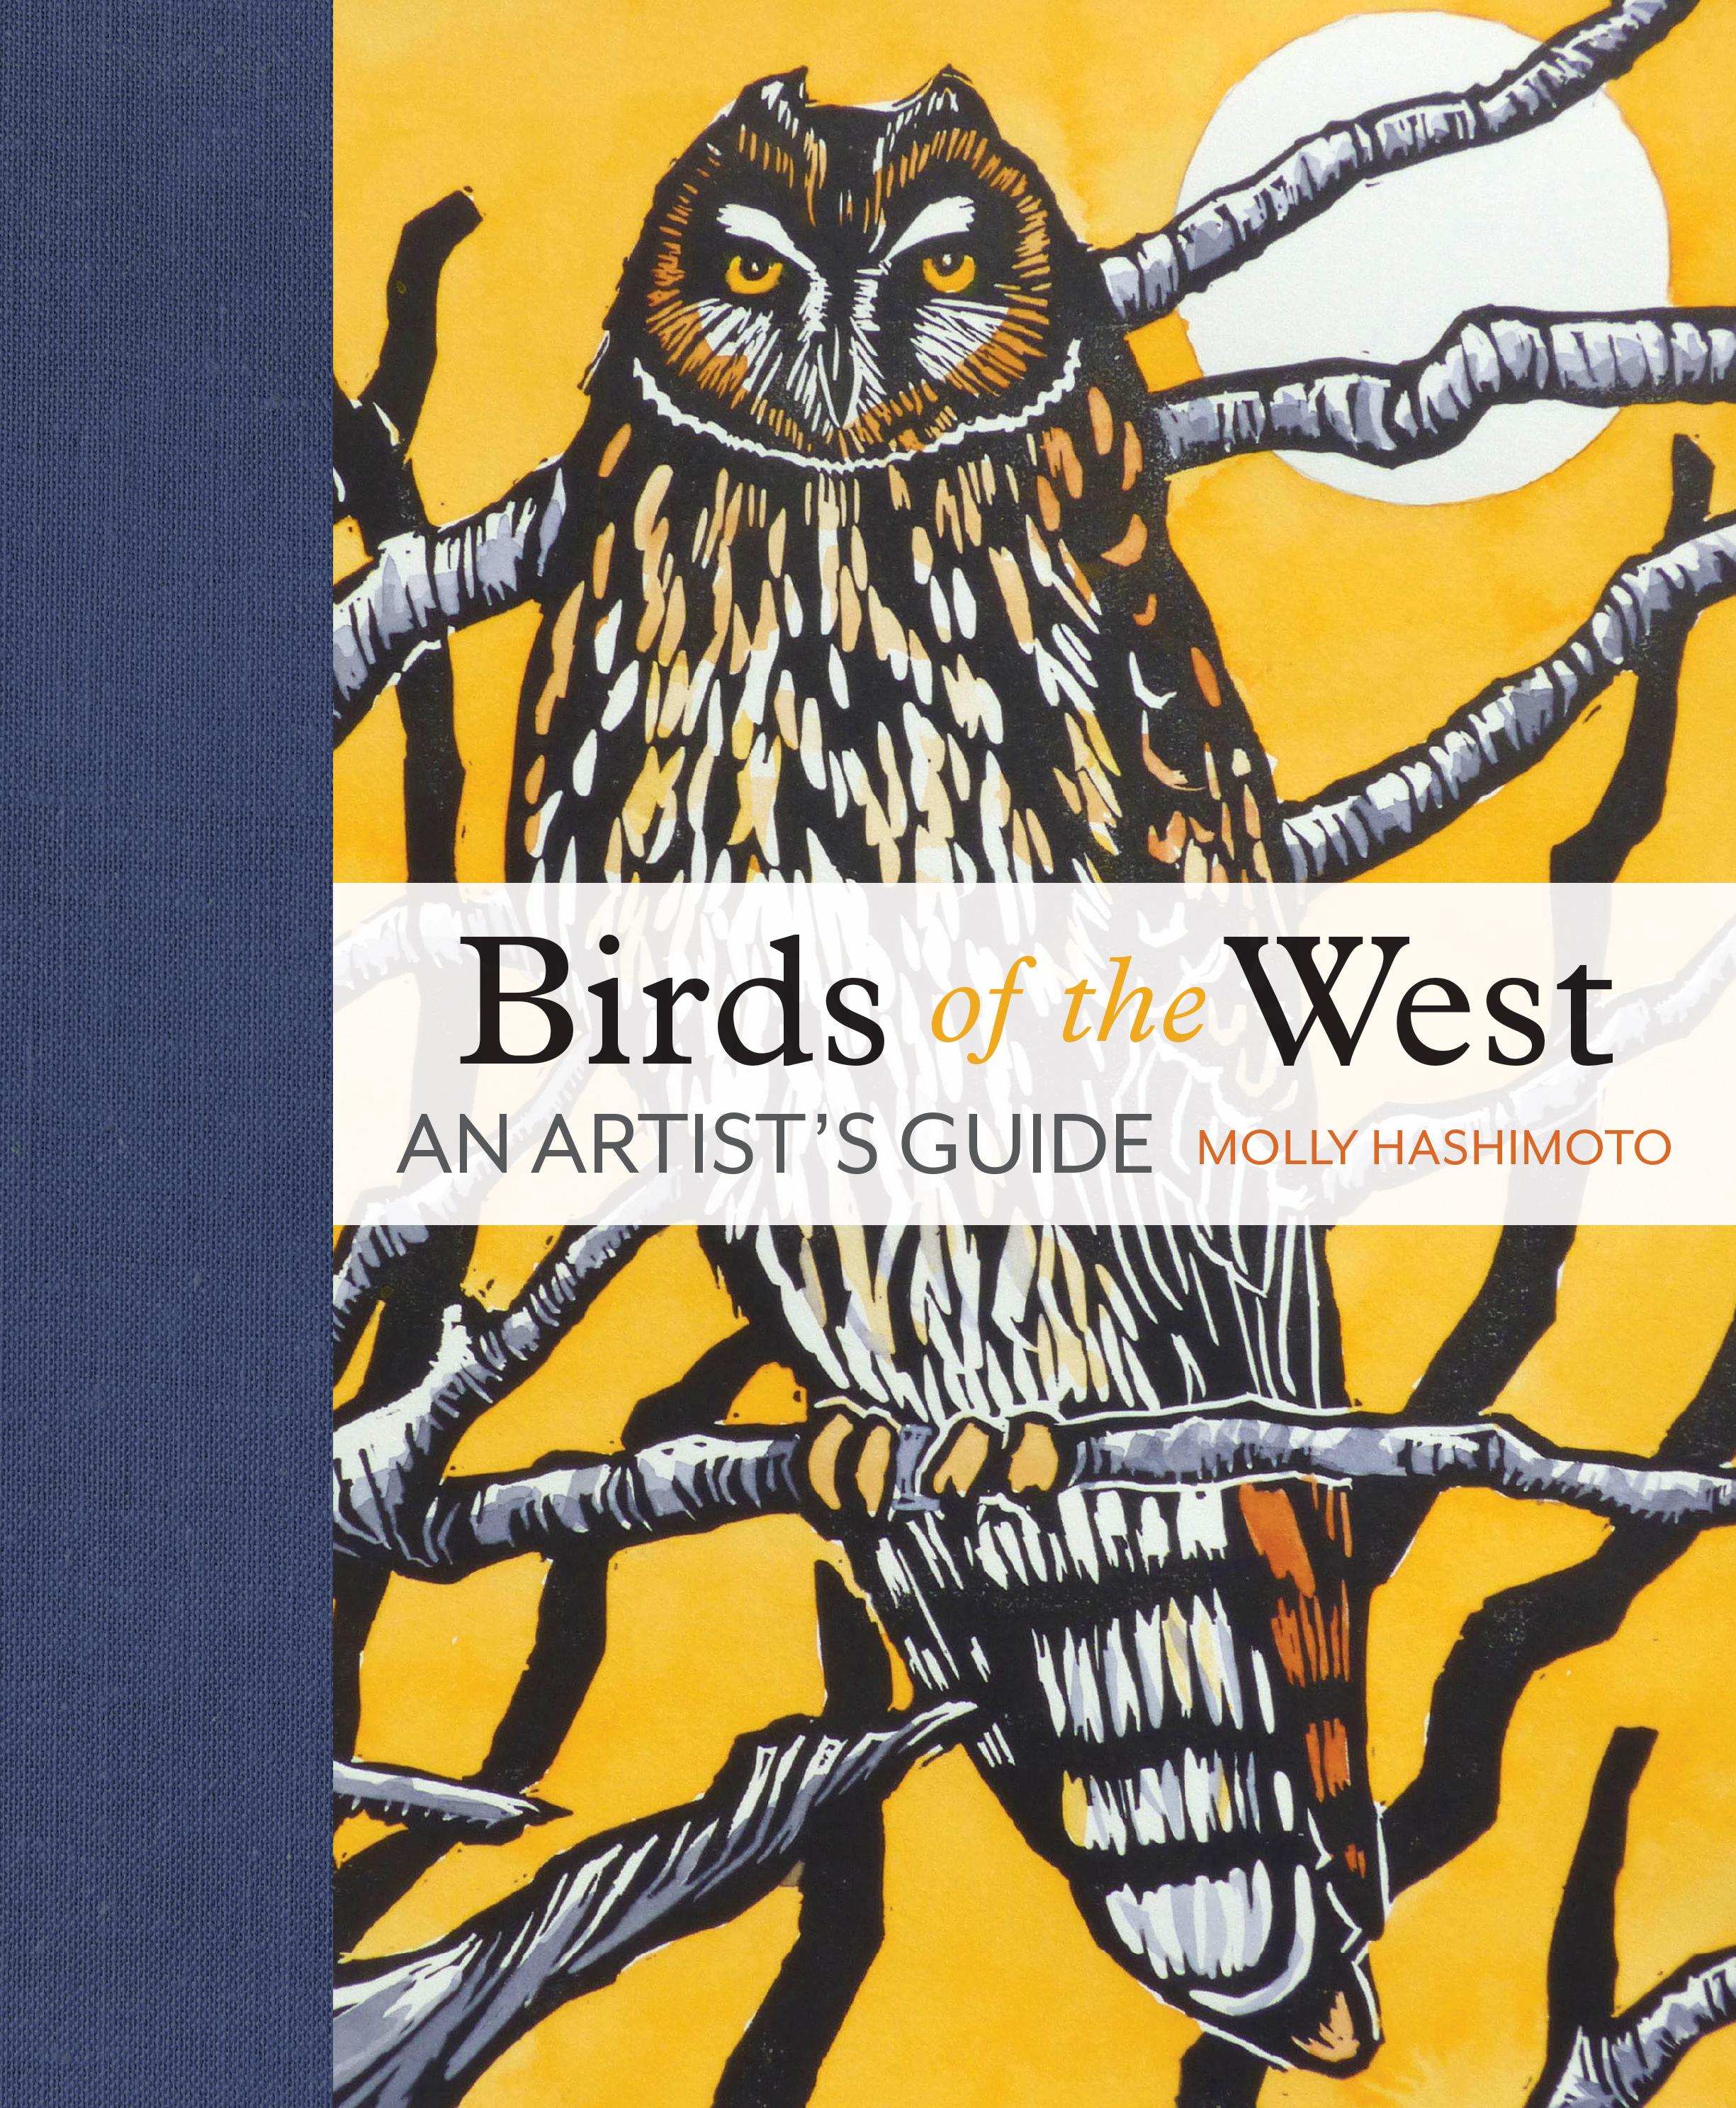 BirdsOfTheWest_Cover_Final_WebF.jpg